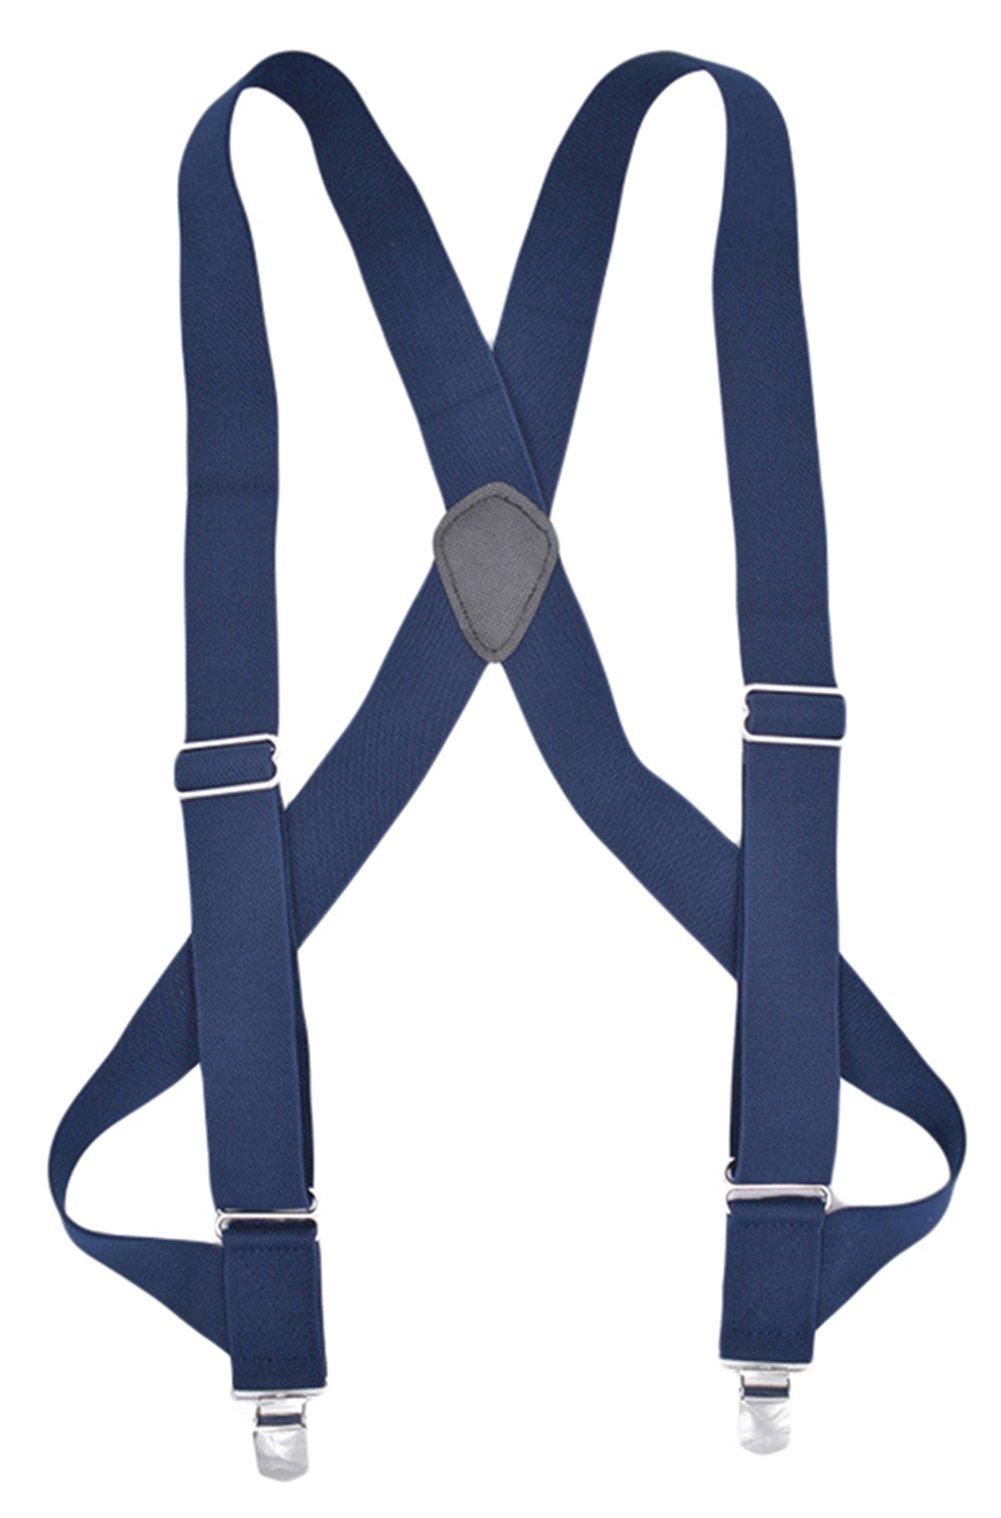 MENDENG Trucker Side Clip Suspenders X-back 1 1/2'' Wide Adjustable Braces Gift by MENDENG